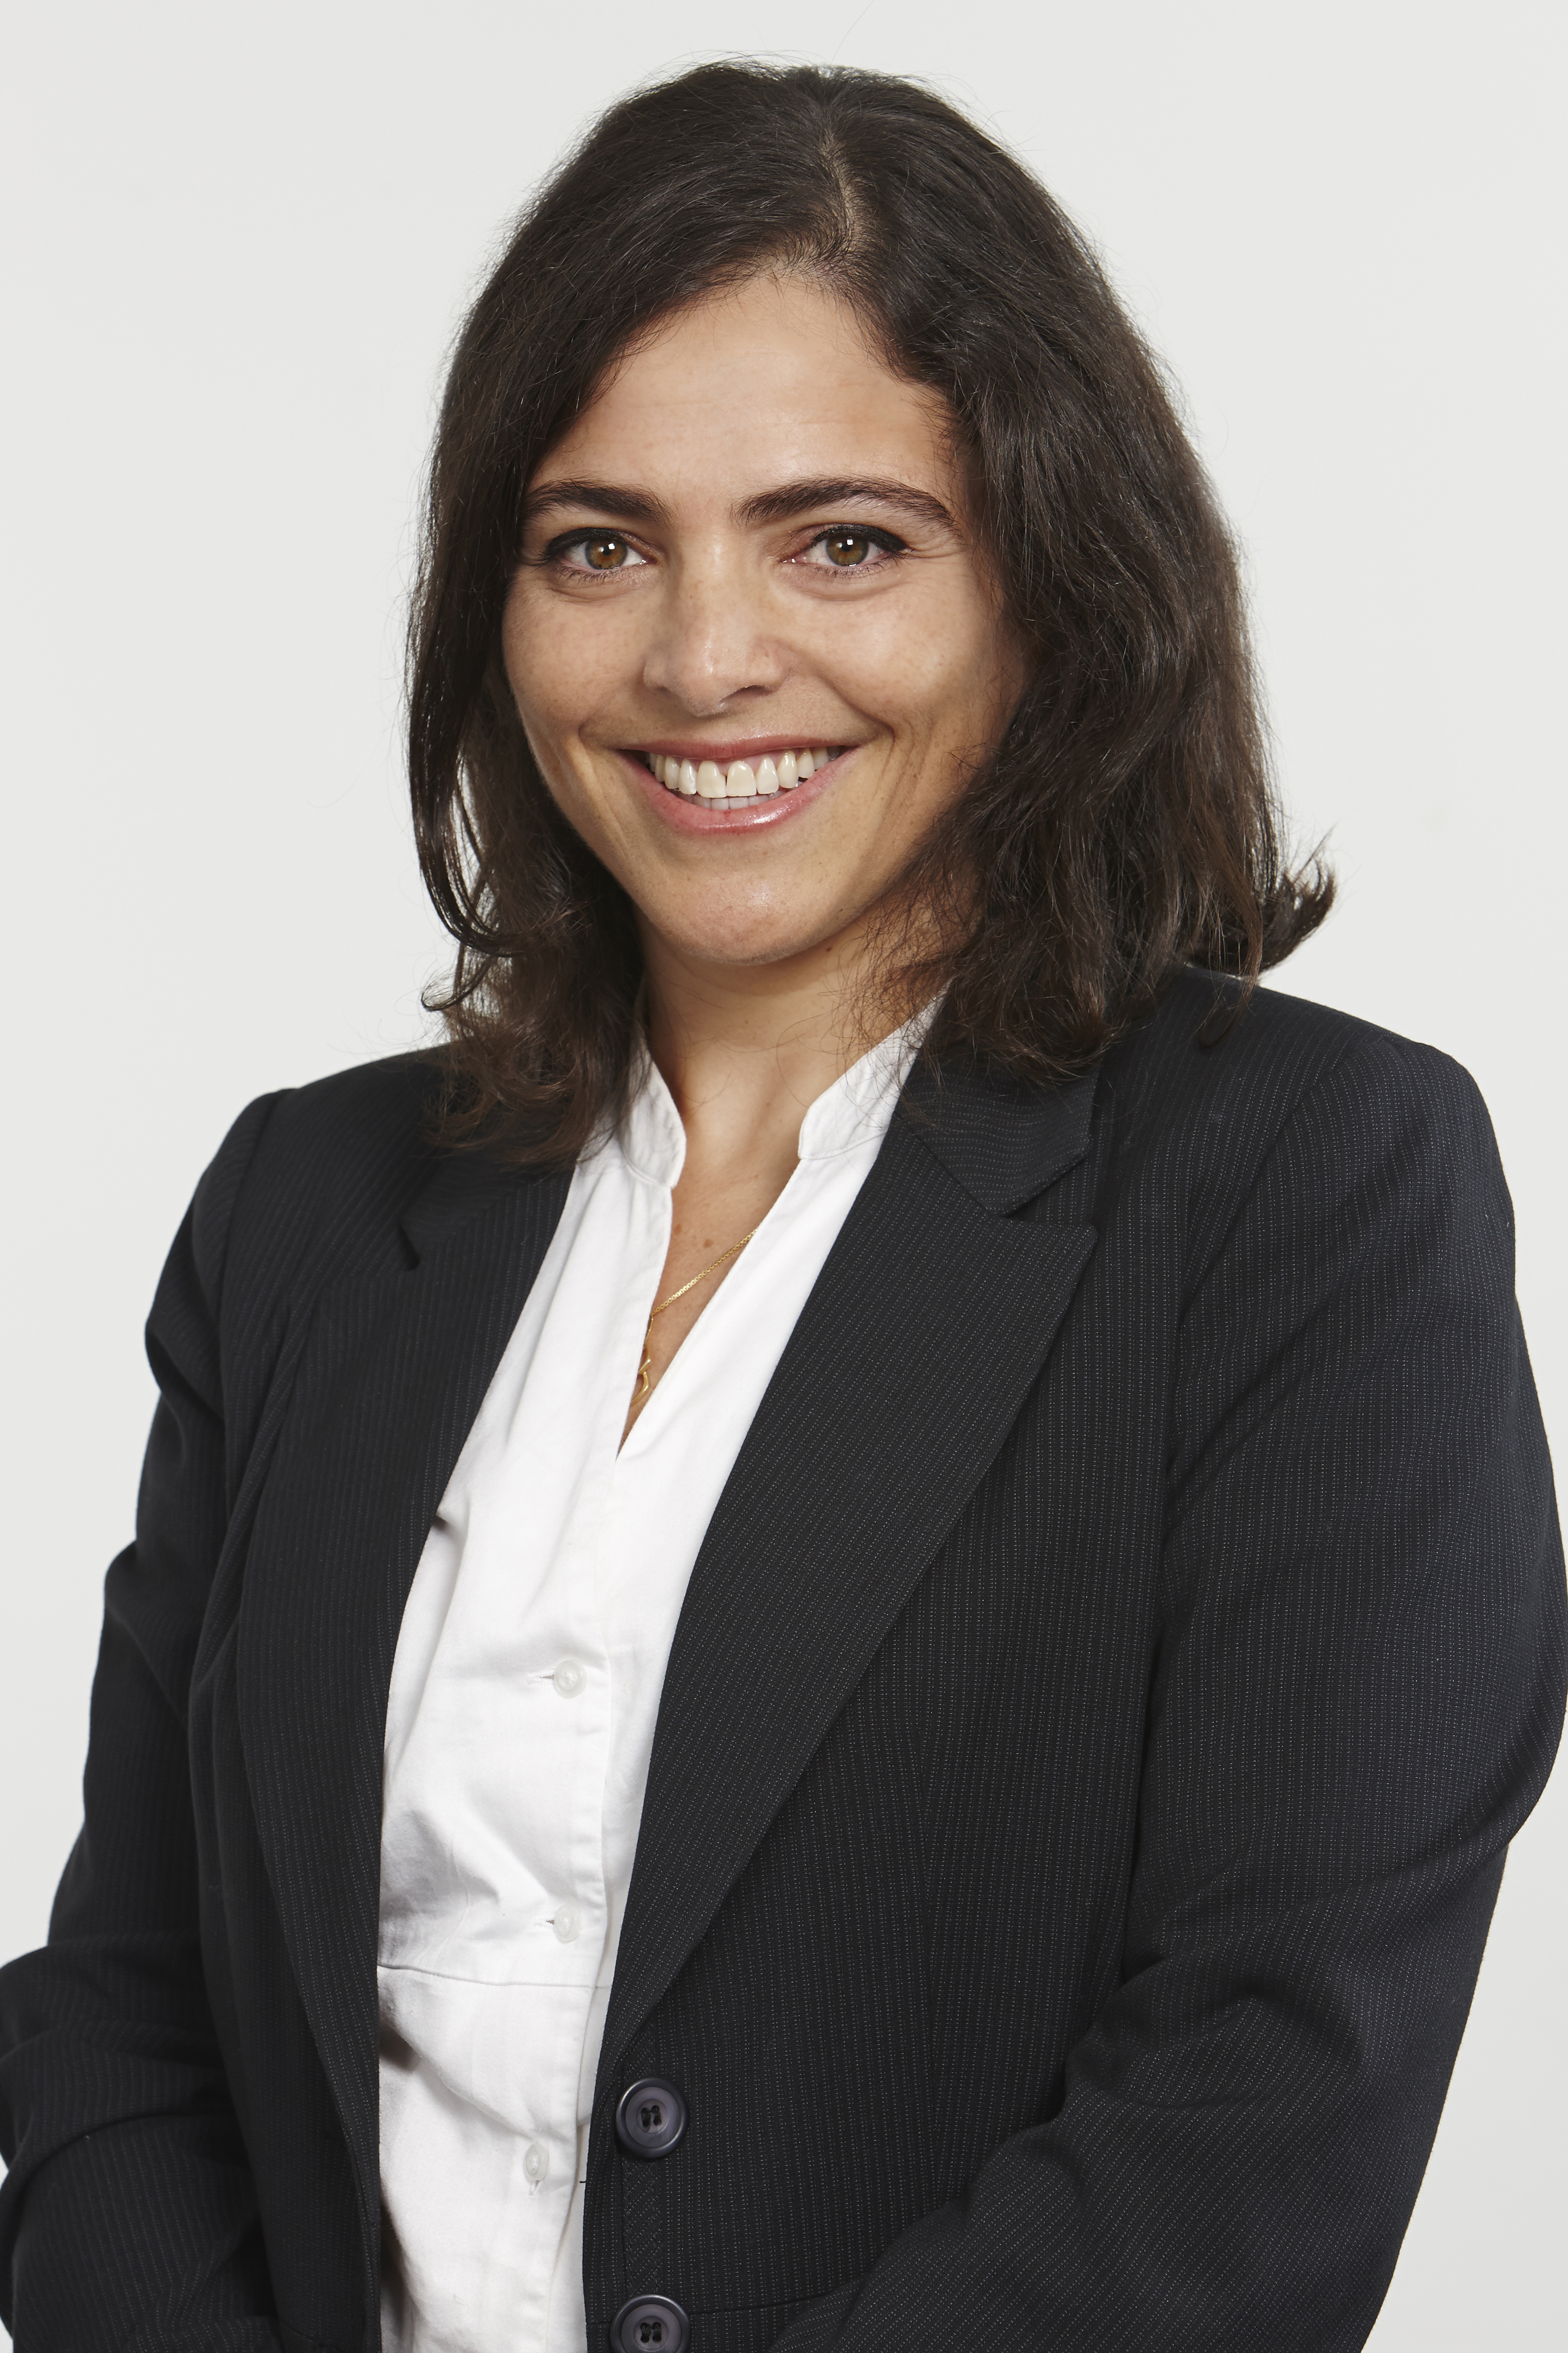 Rebecca Preston, LLB (Hons), BSc, LLM